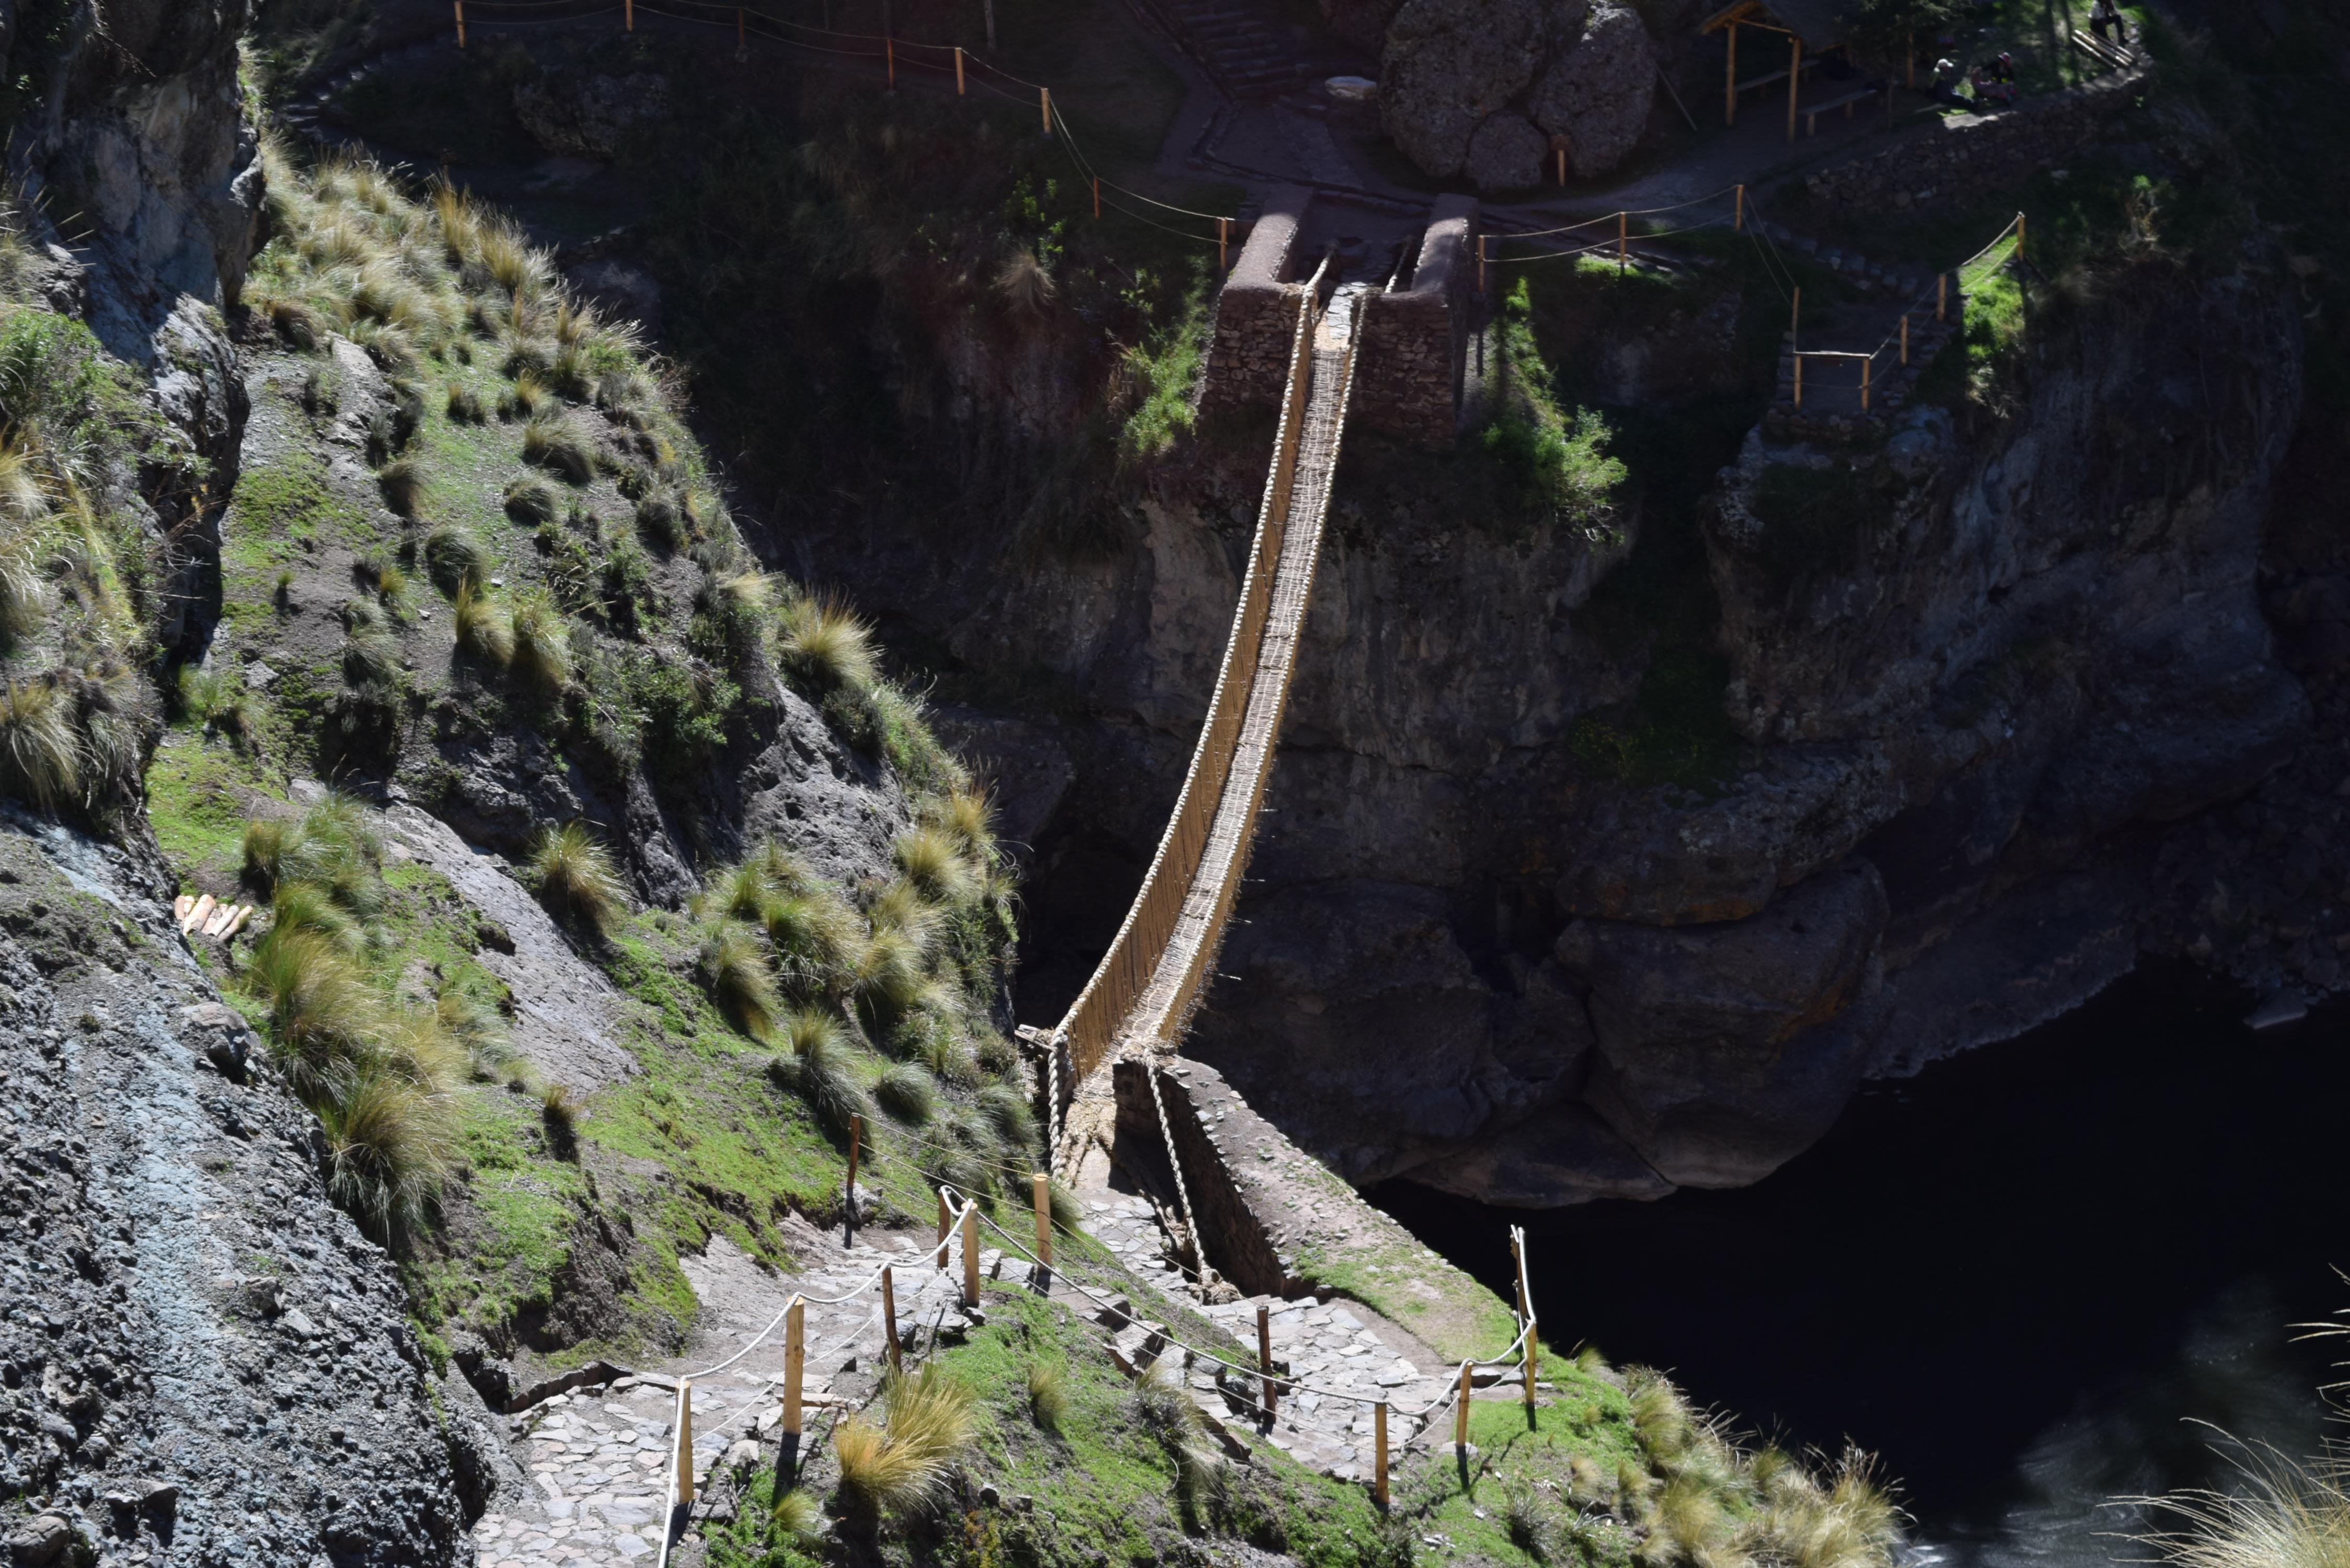 Explore the Bridge of Inca and its surroundings in Peru